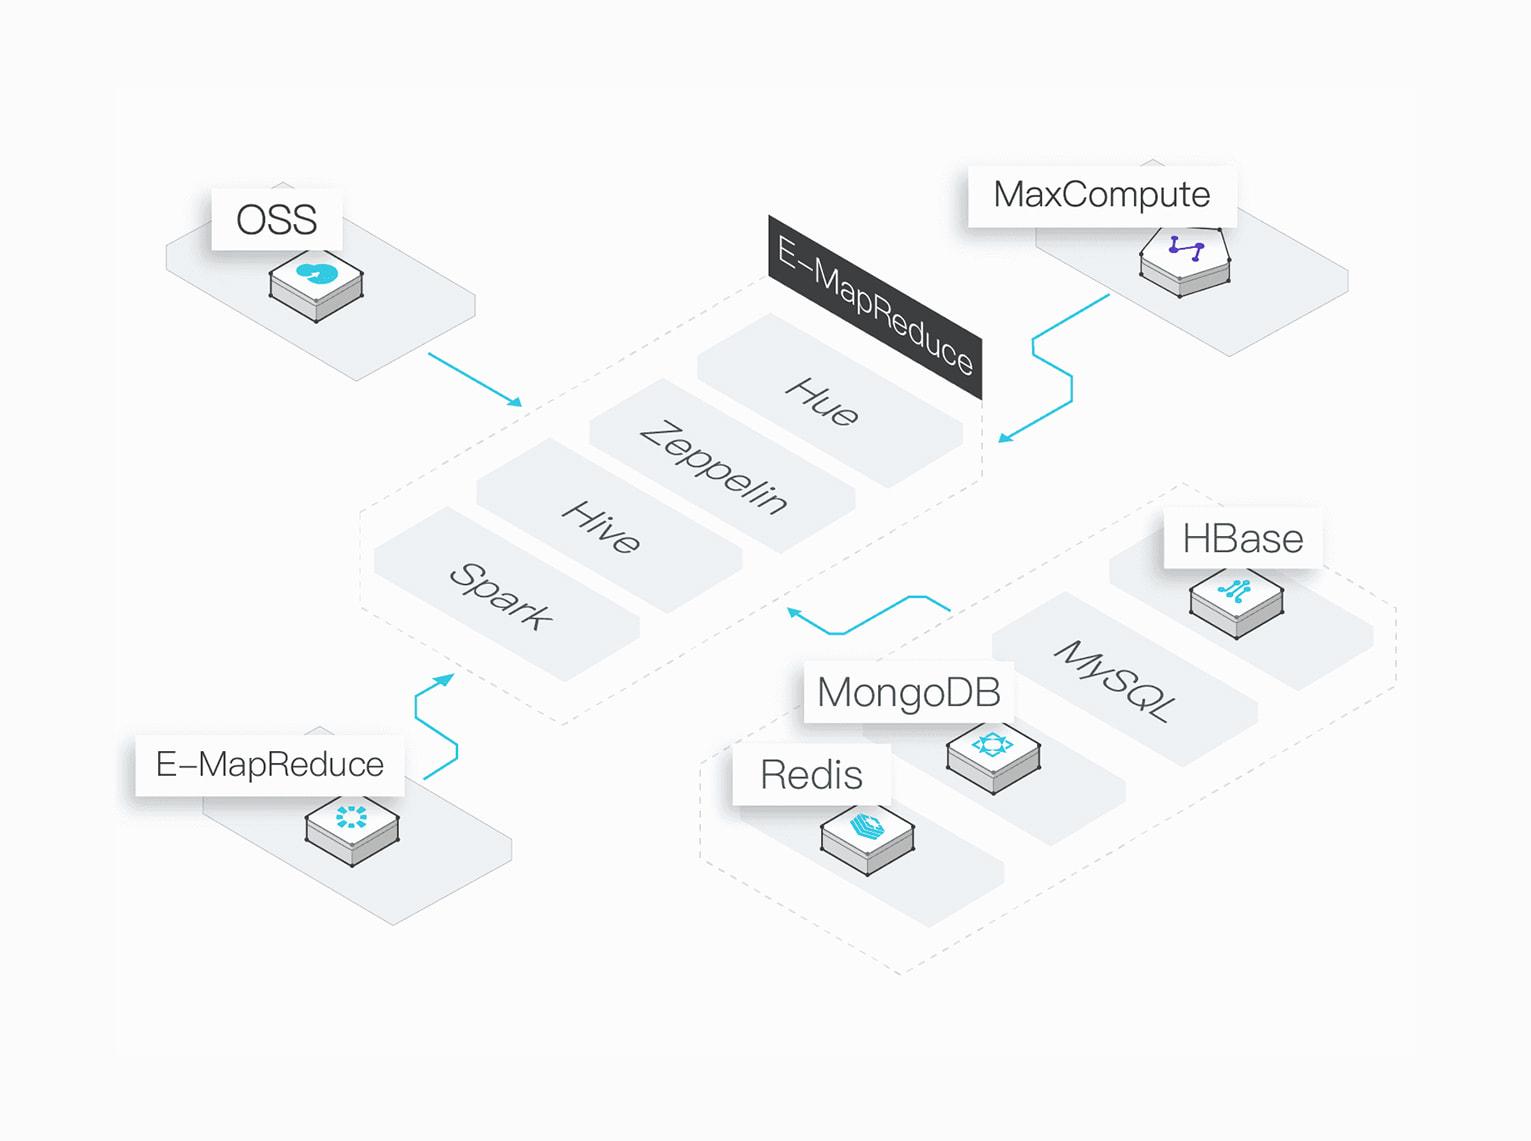 E-MapReduce Service: Big Data Processing and Analysis